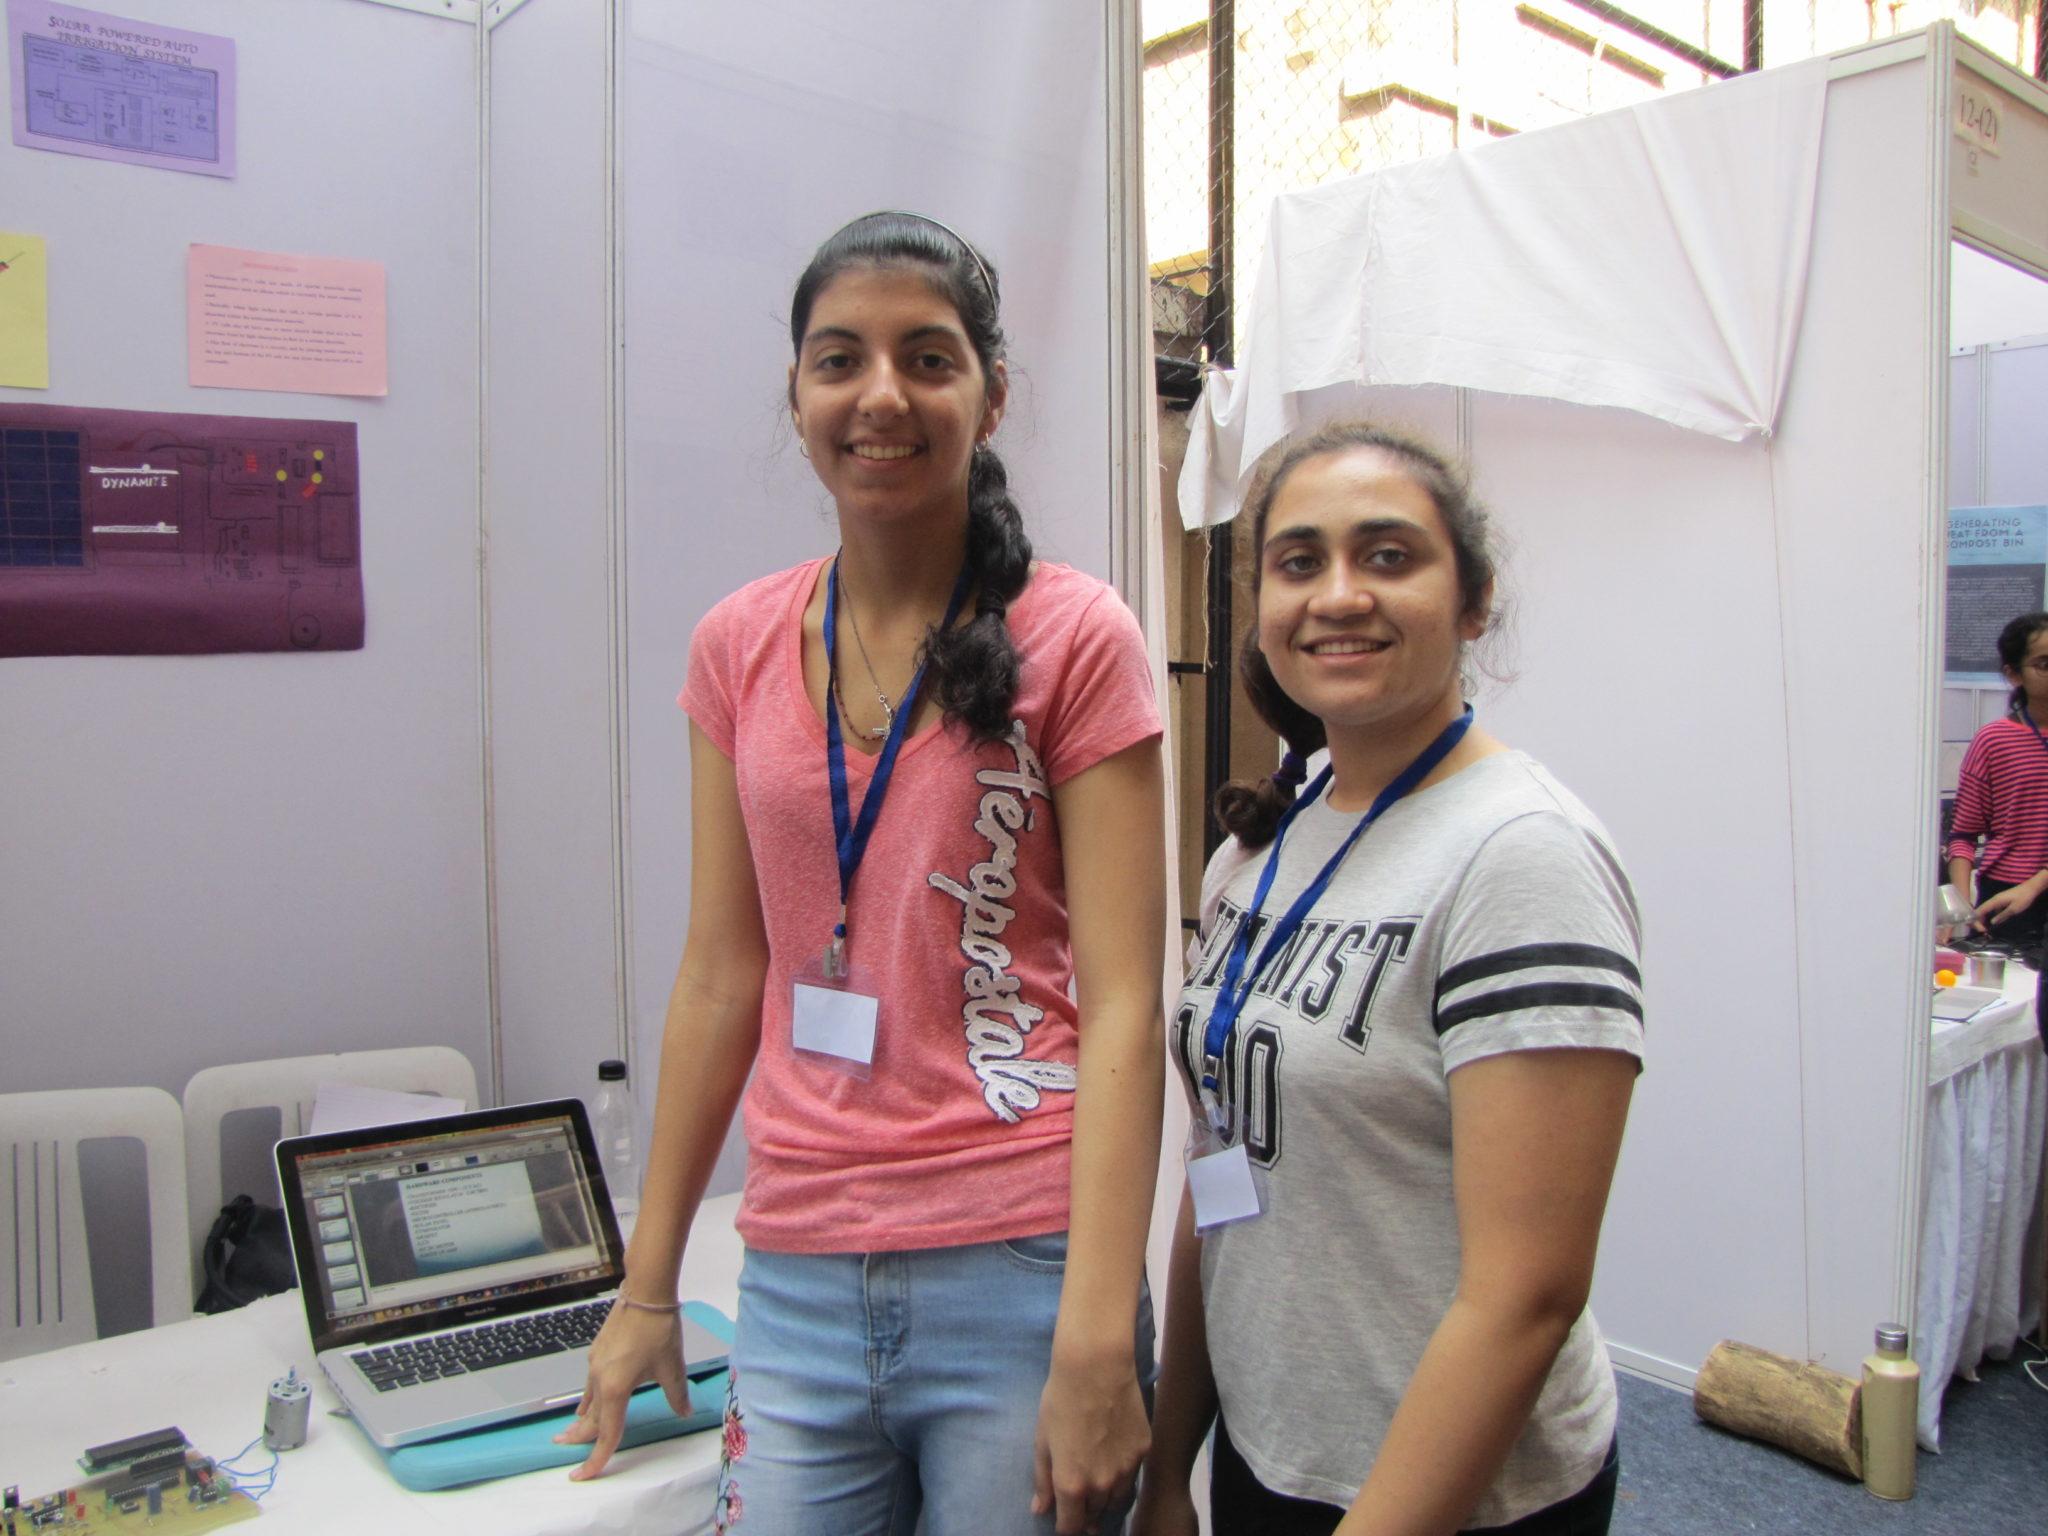 Interschool Science Fair 2017